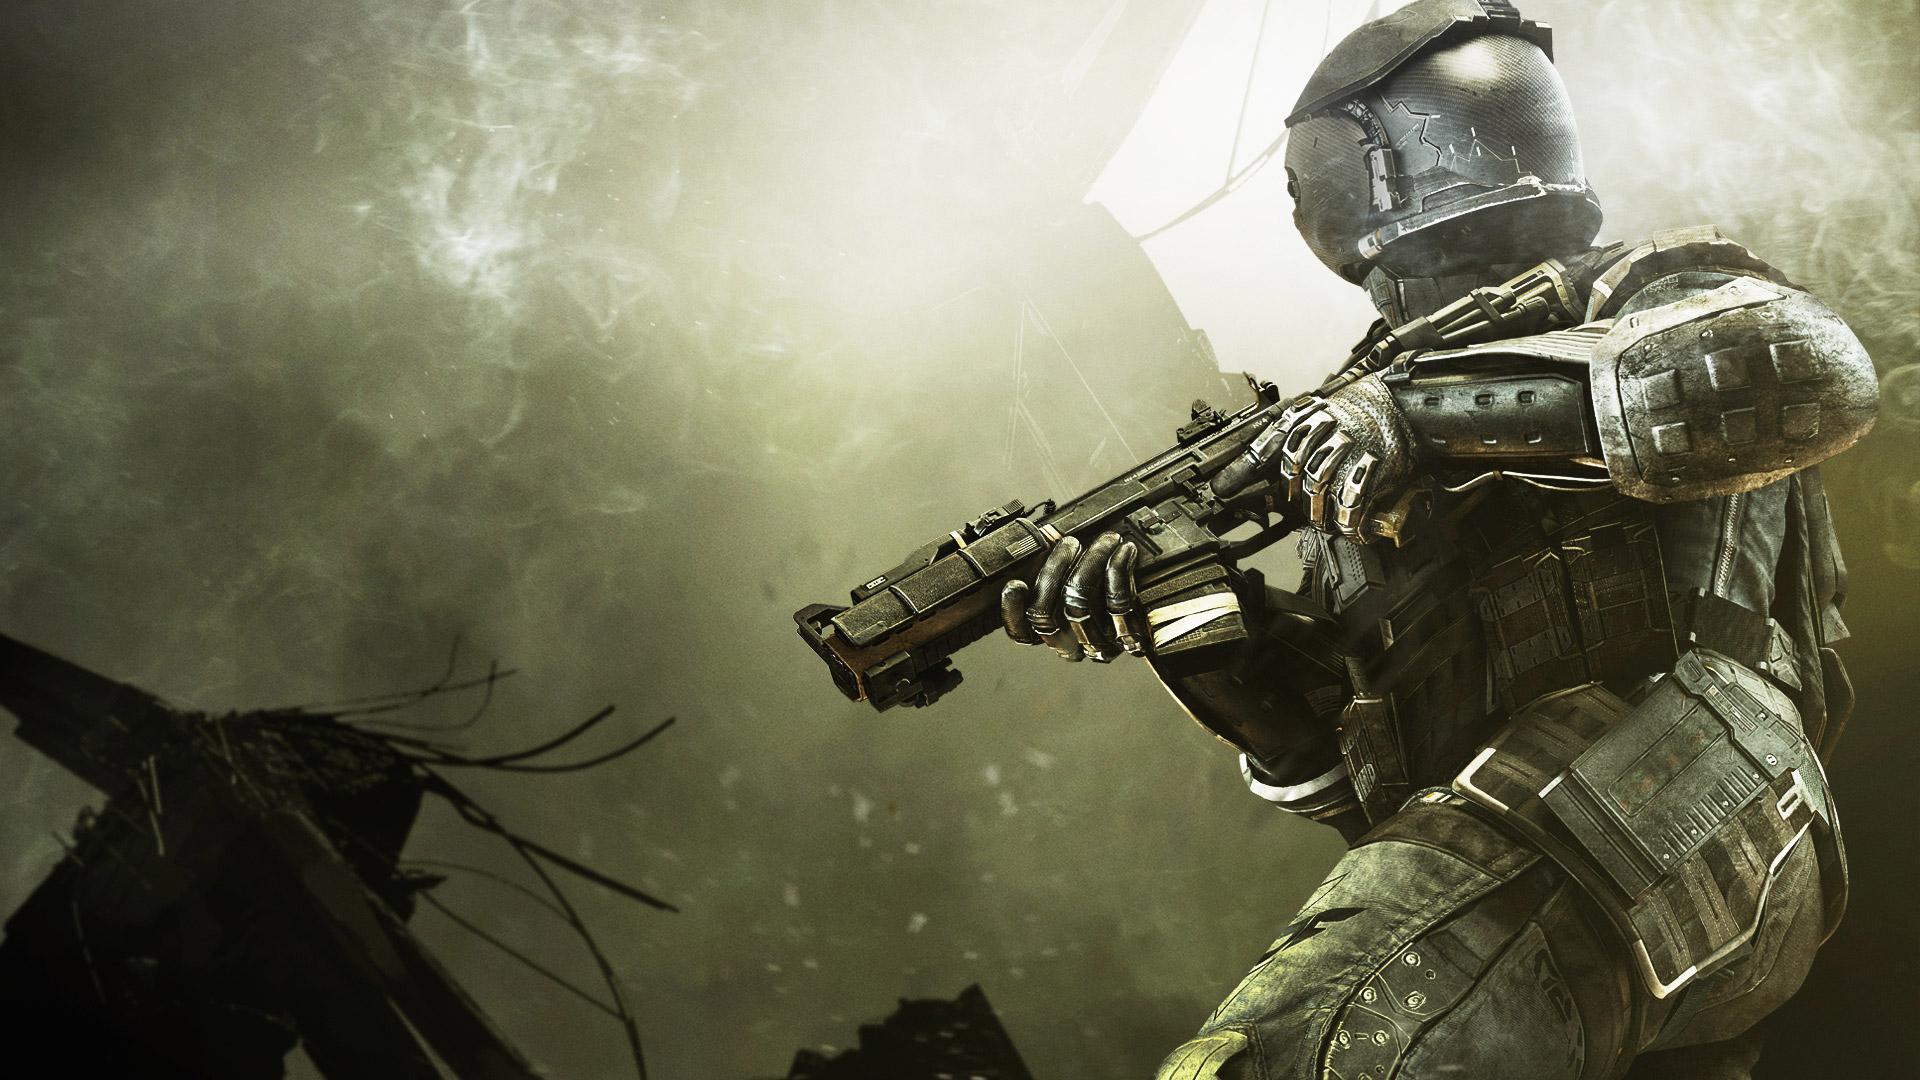 Free Call of Duty: Infinite Warfare Wallpaper in 1920x1080